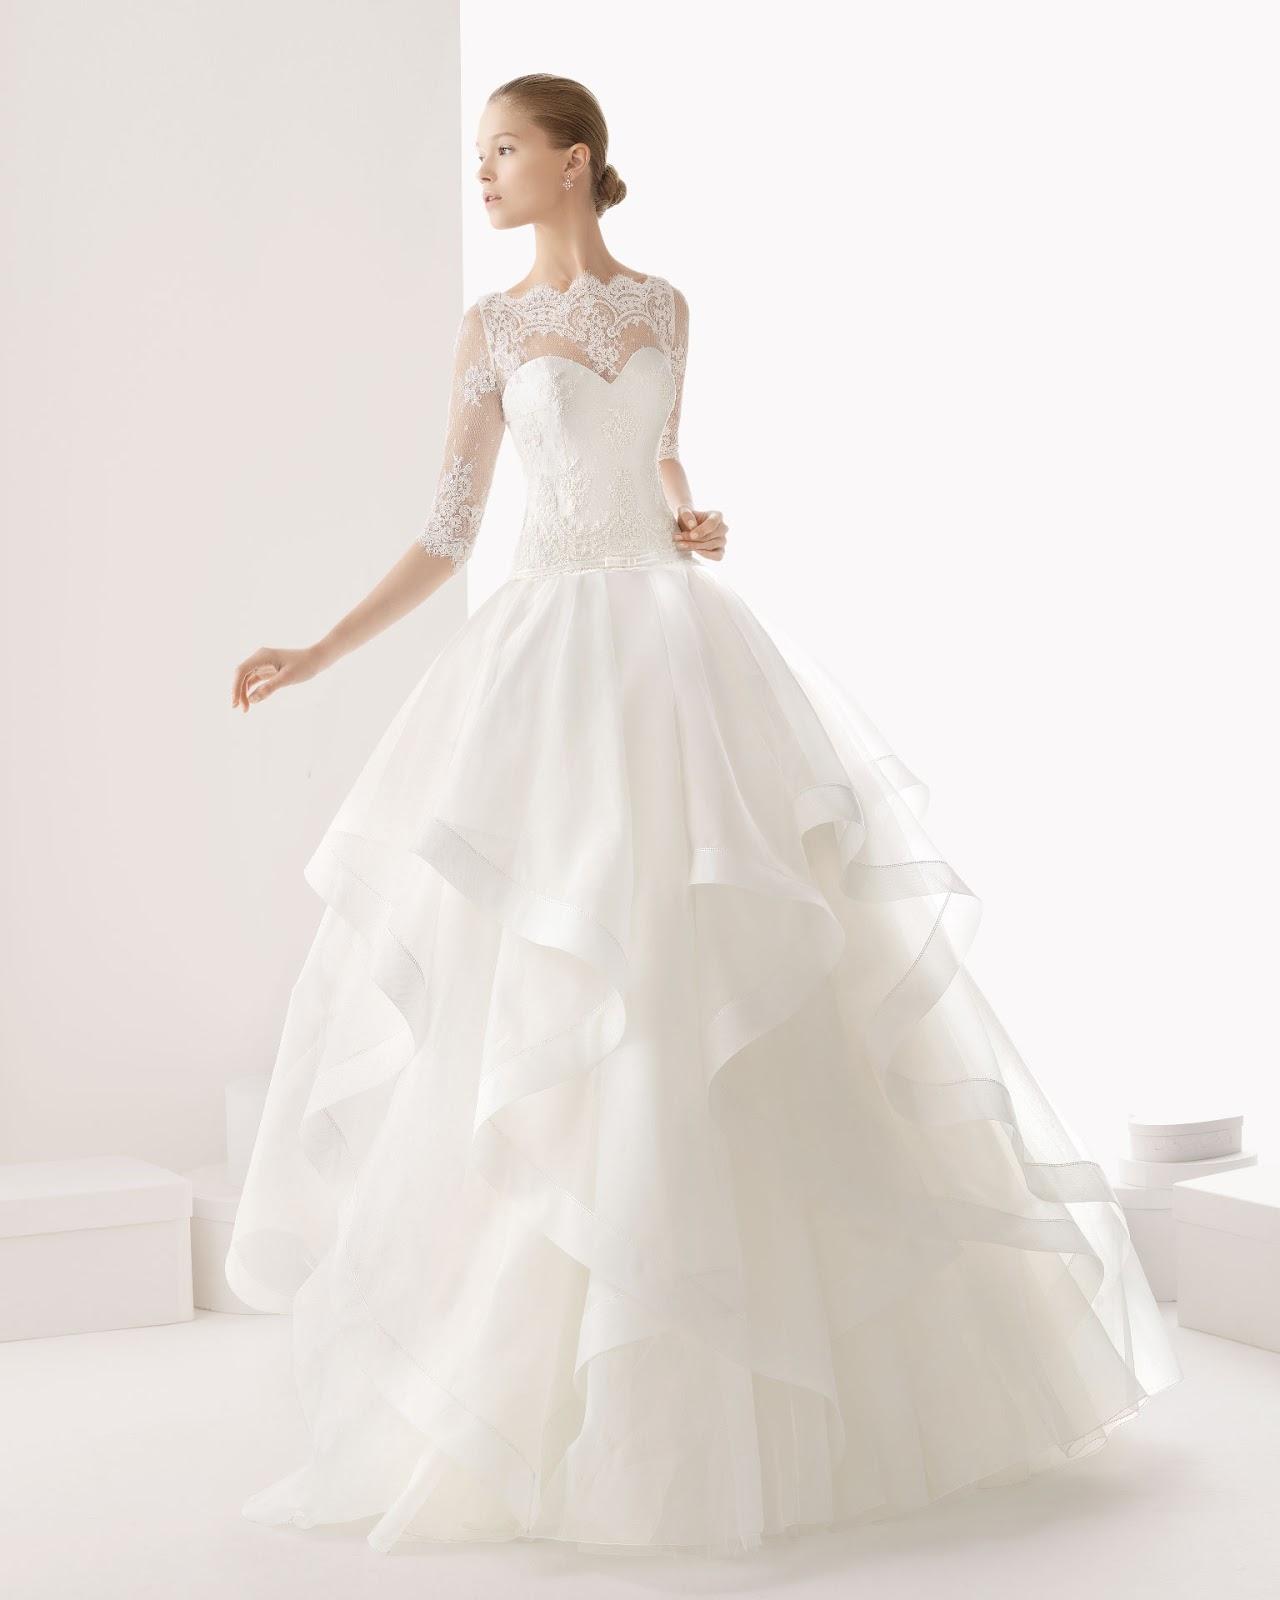 Long sleeved wedding dresses vera wang - Dress on sale